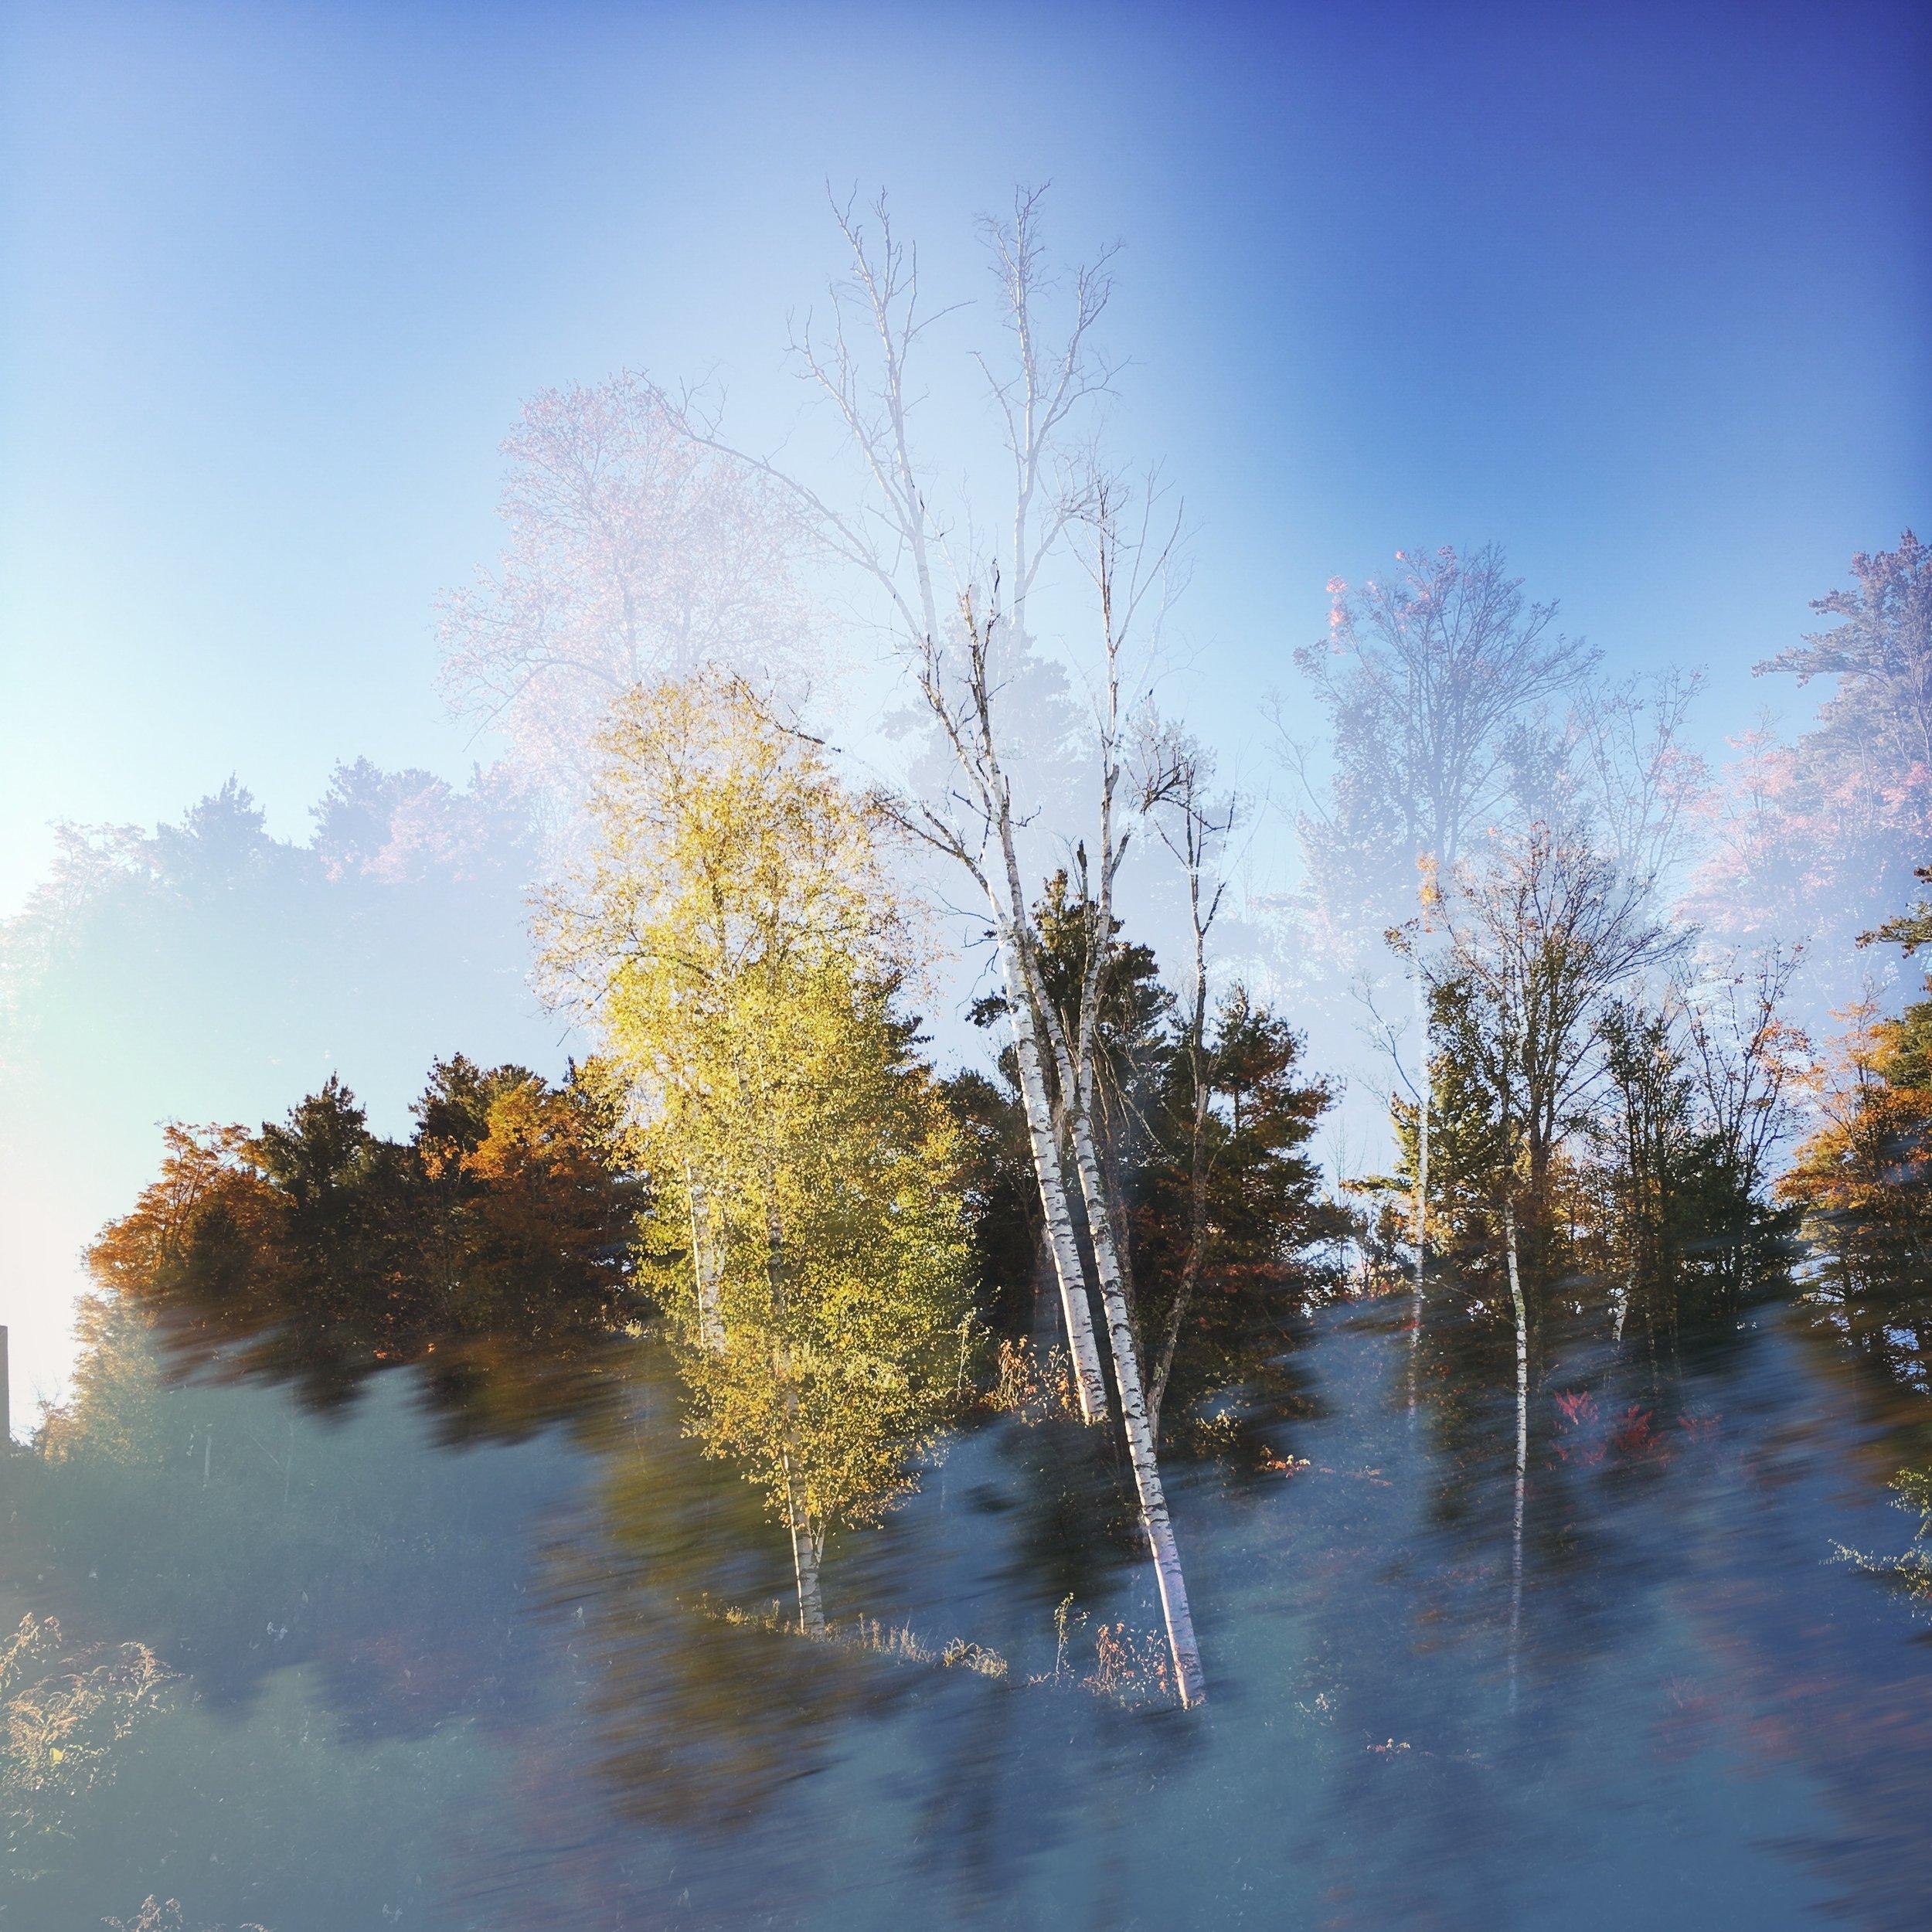 ©Golden Tree by Dena T Bray